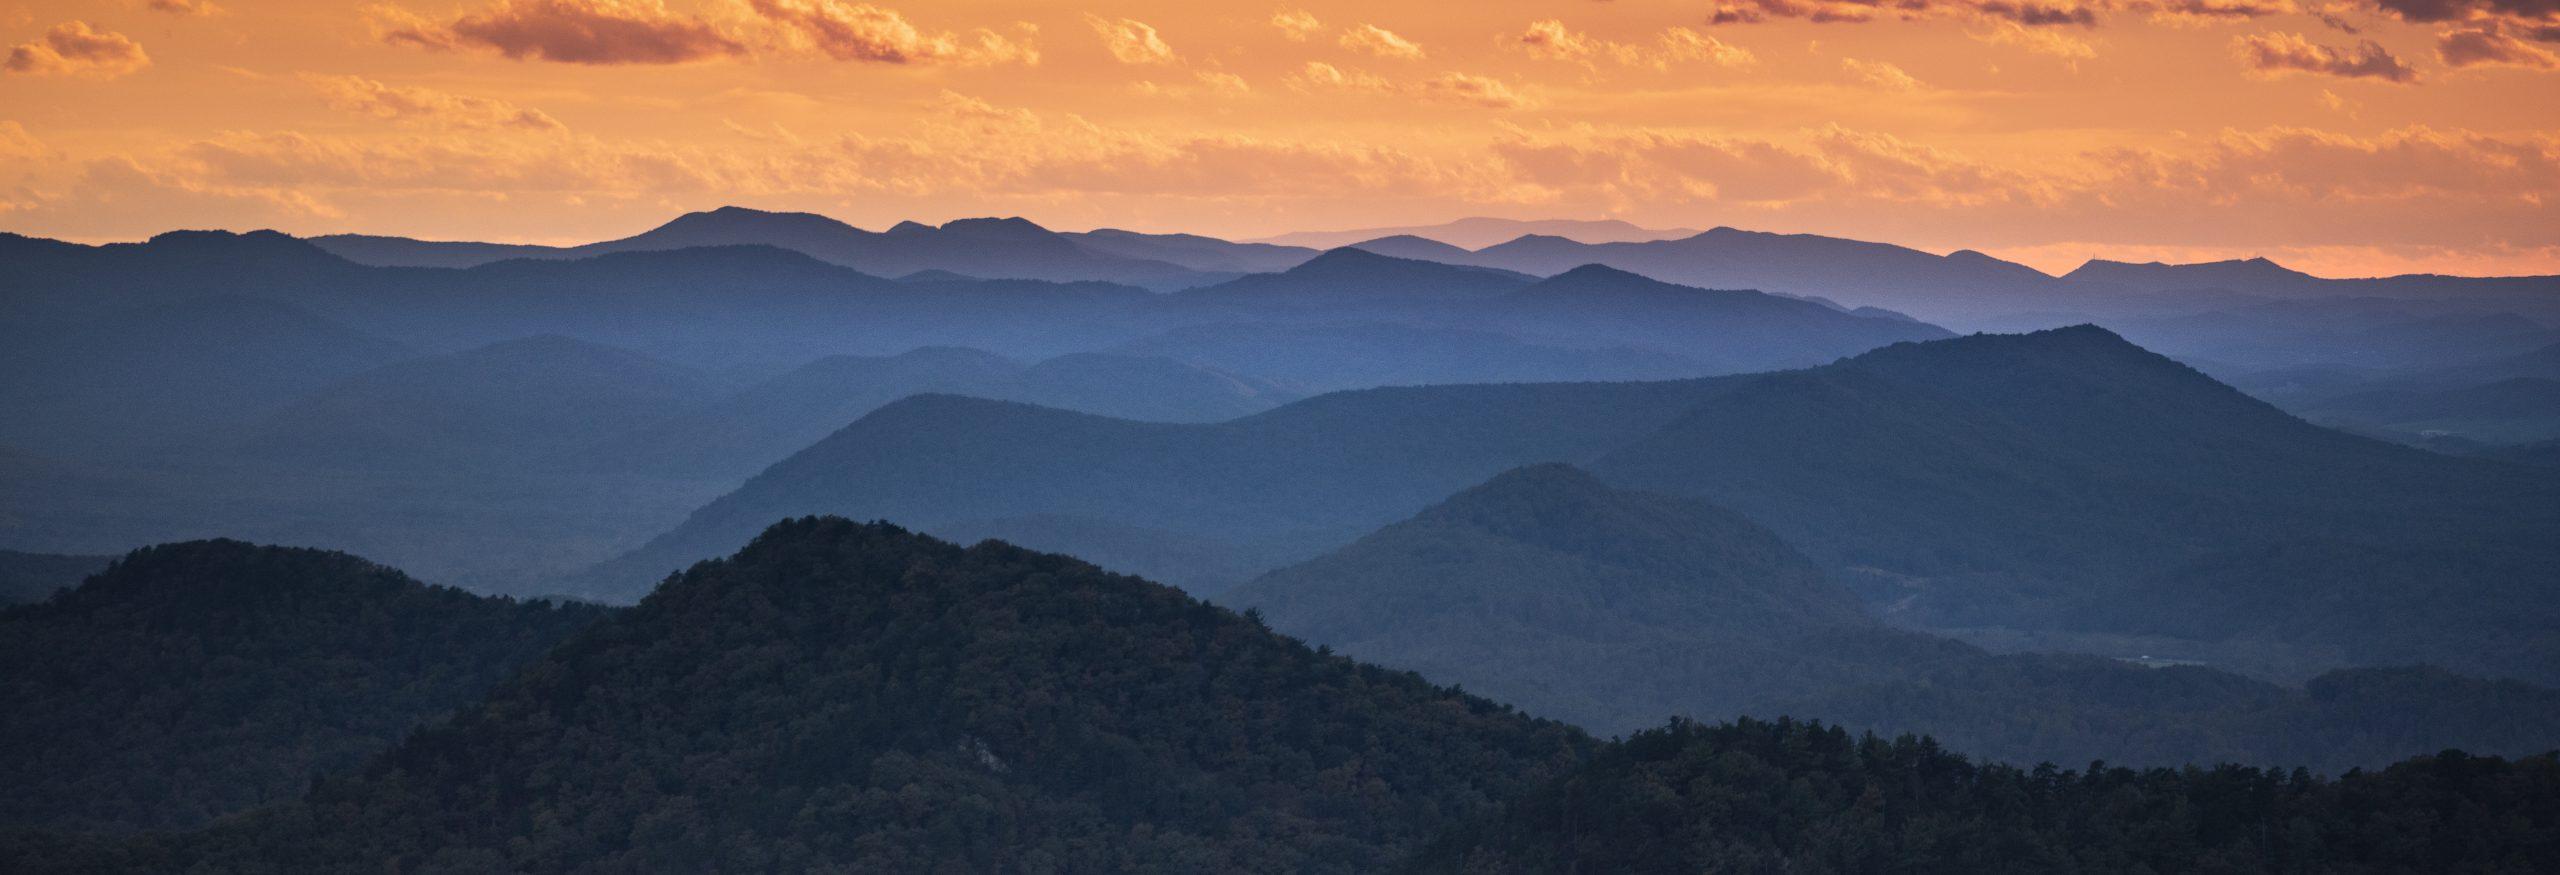 Blue Ridge Mountains scenic panorama vista view